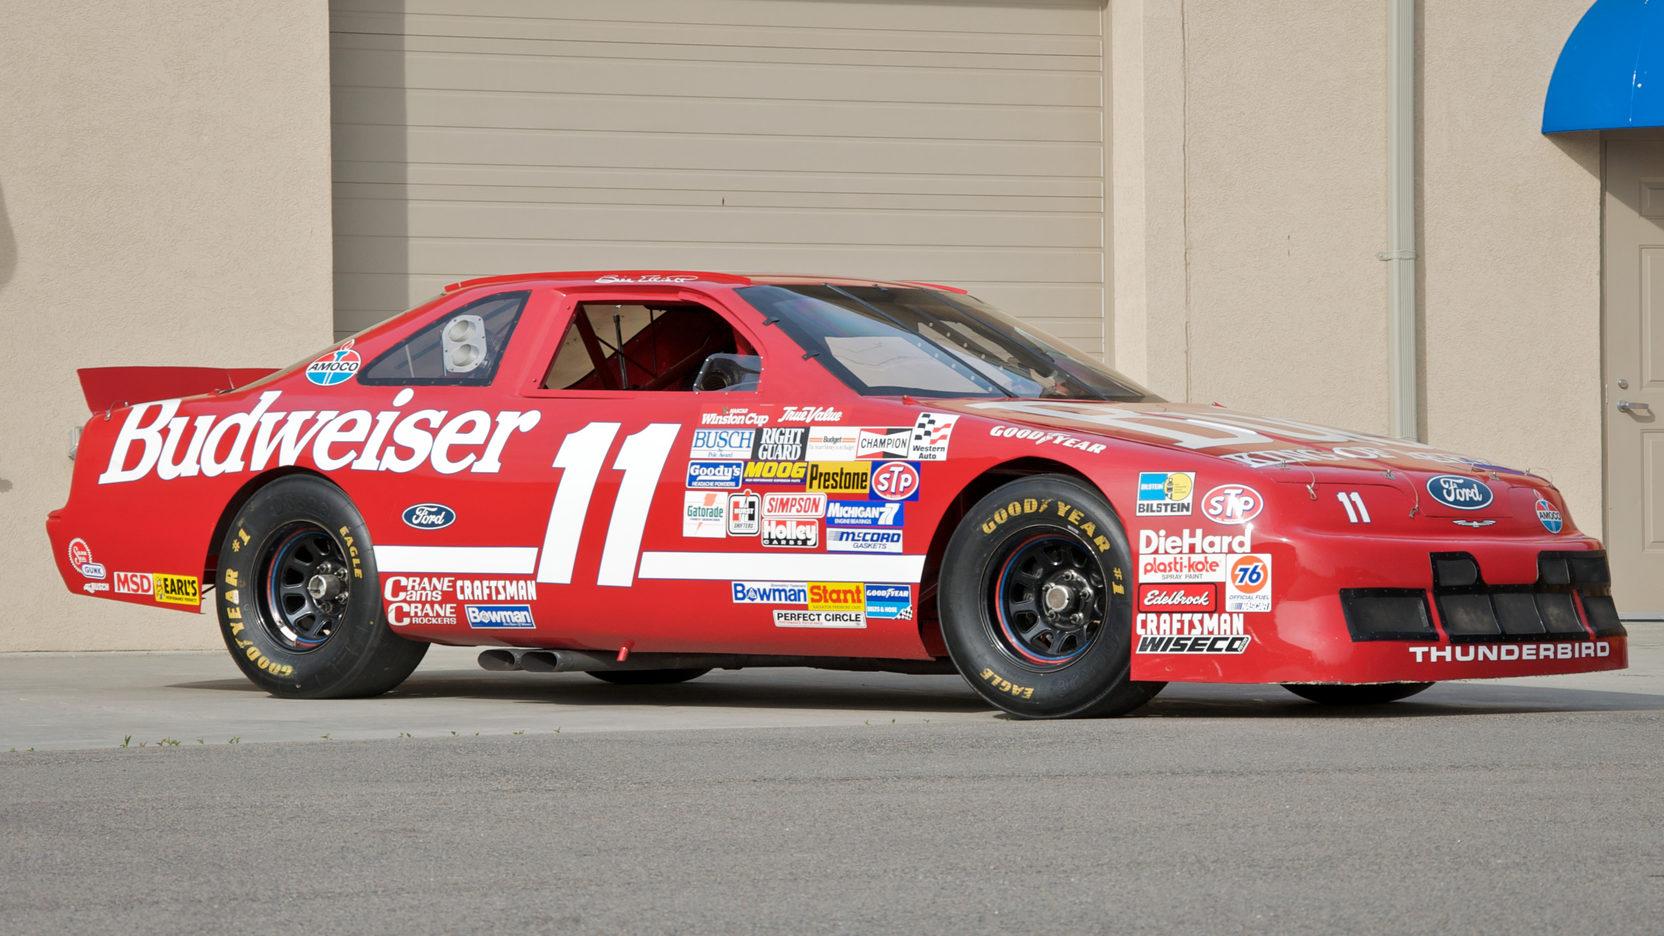 1992 Ford Thunderbird NASCAR 3/4 front